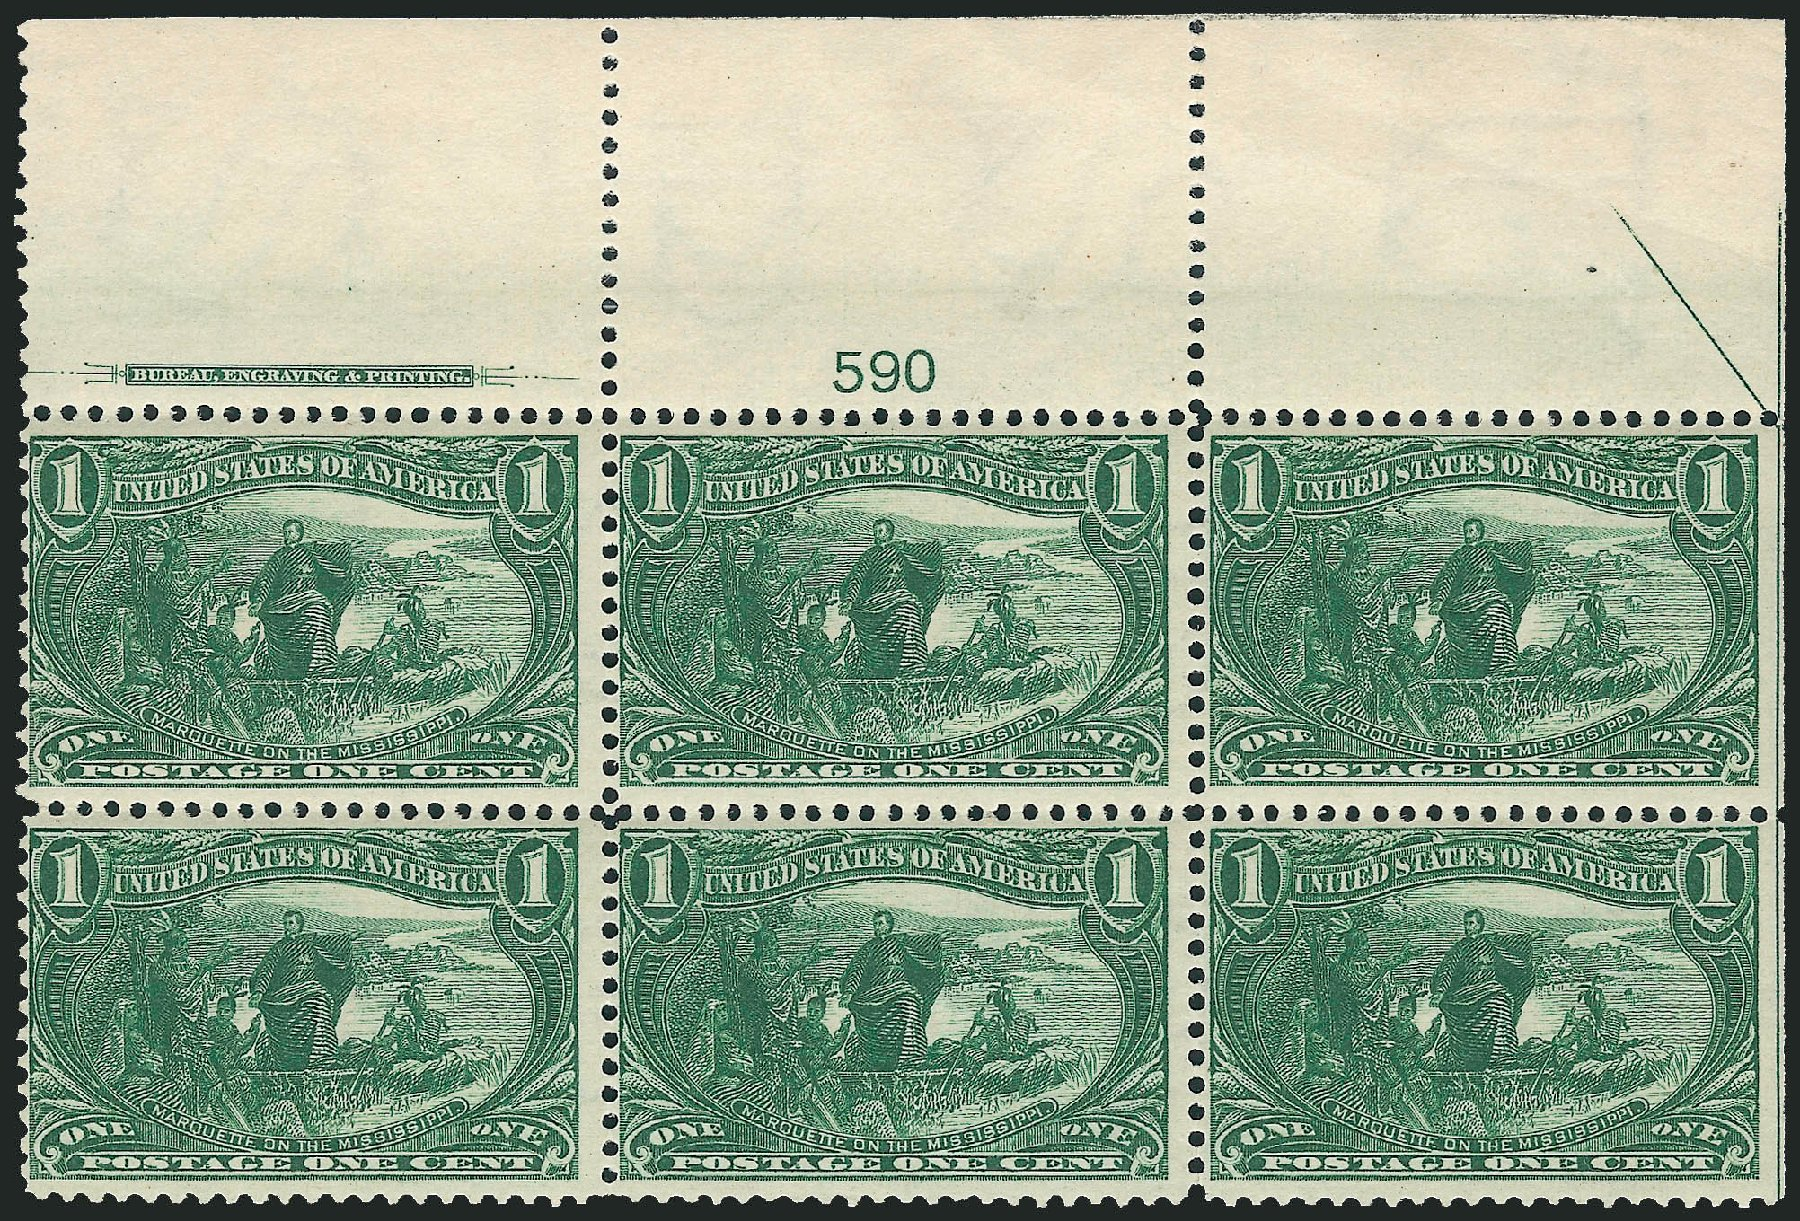 US Stamp Value Scott Catalogue #285 - 1c 1898 Trans Mississippi ...